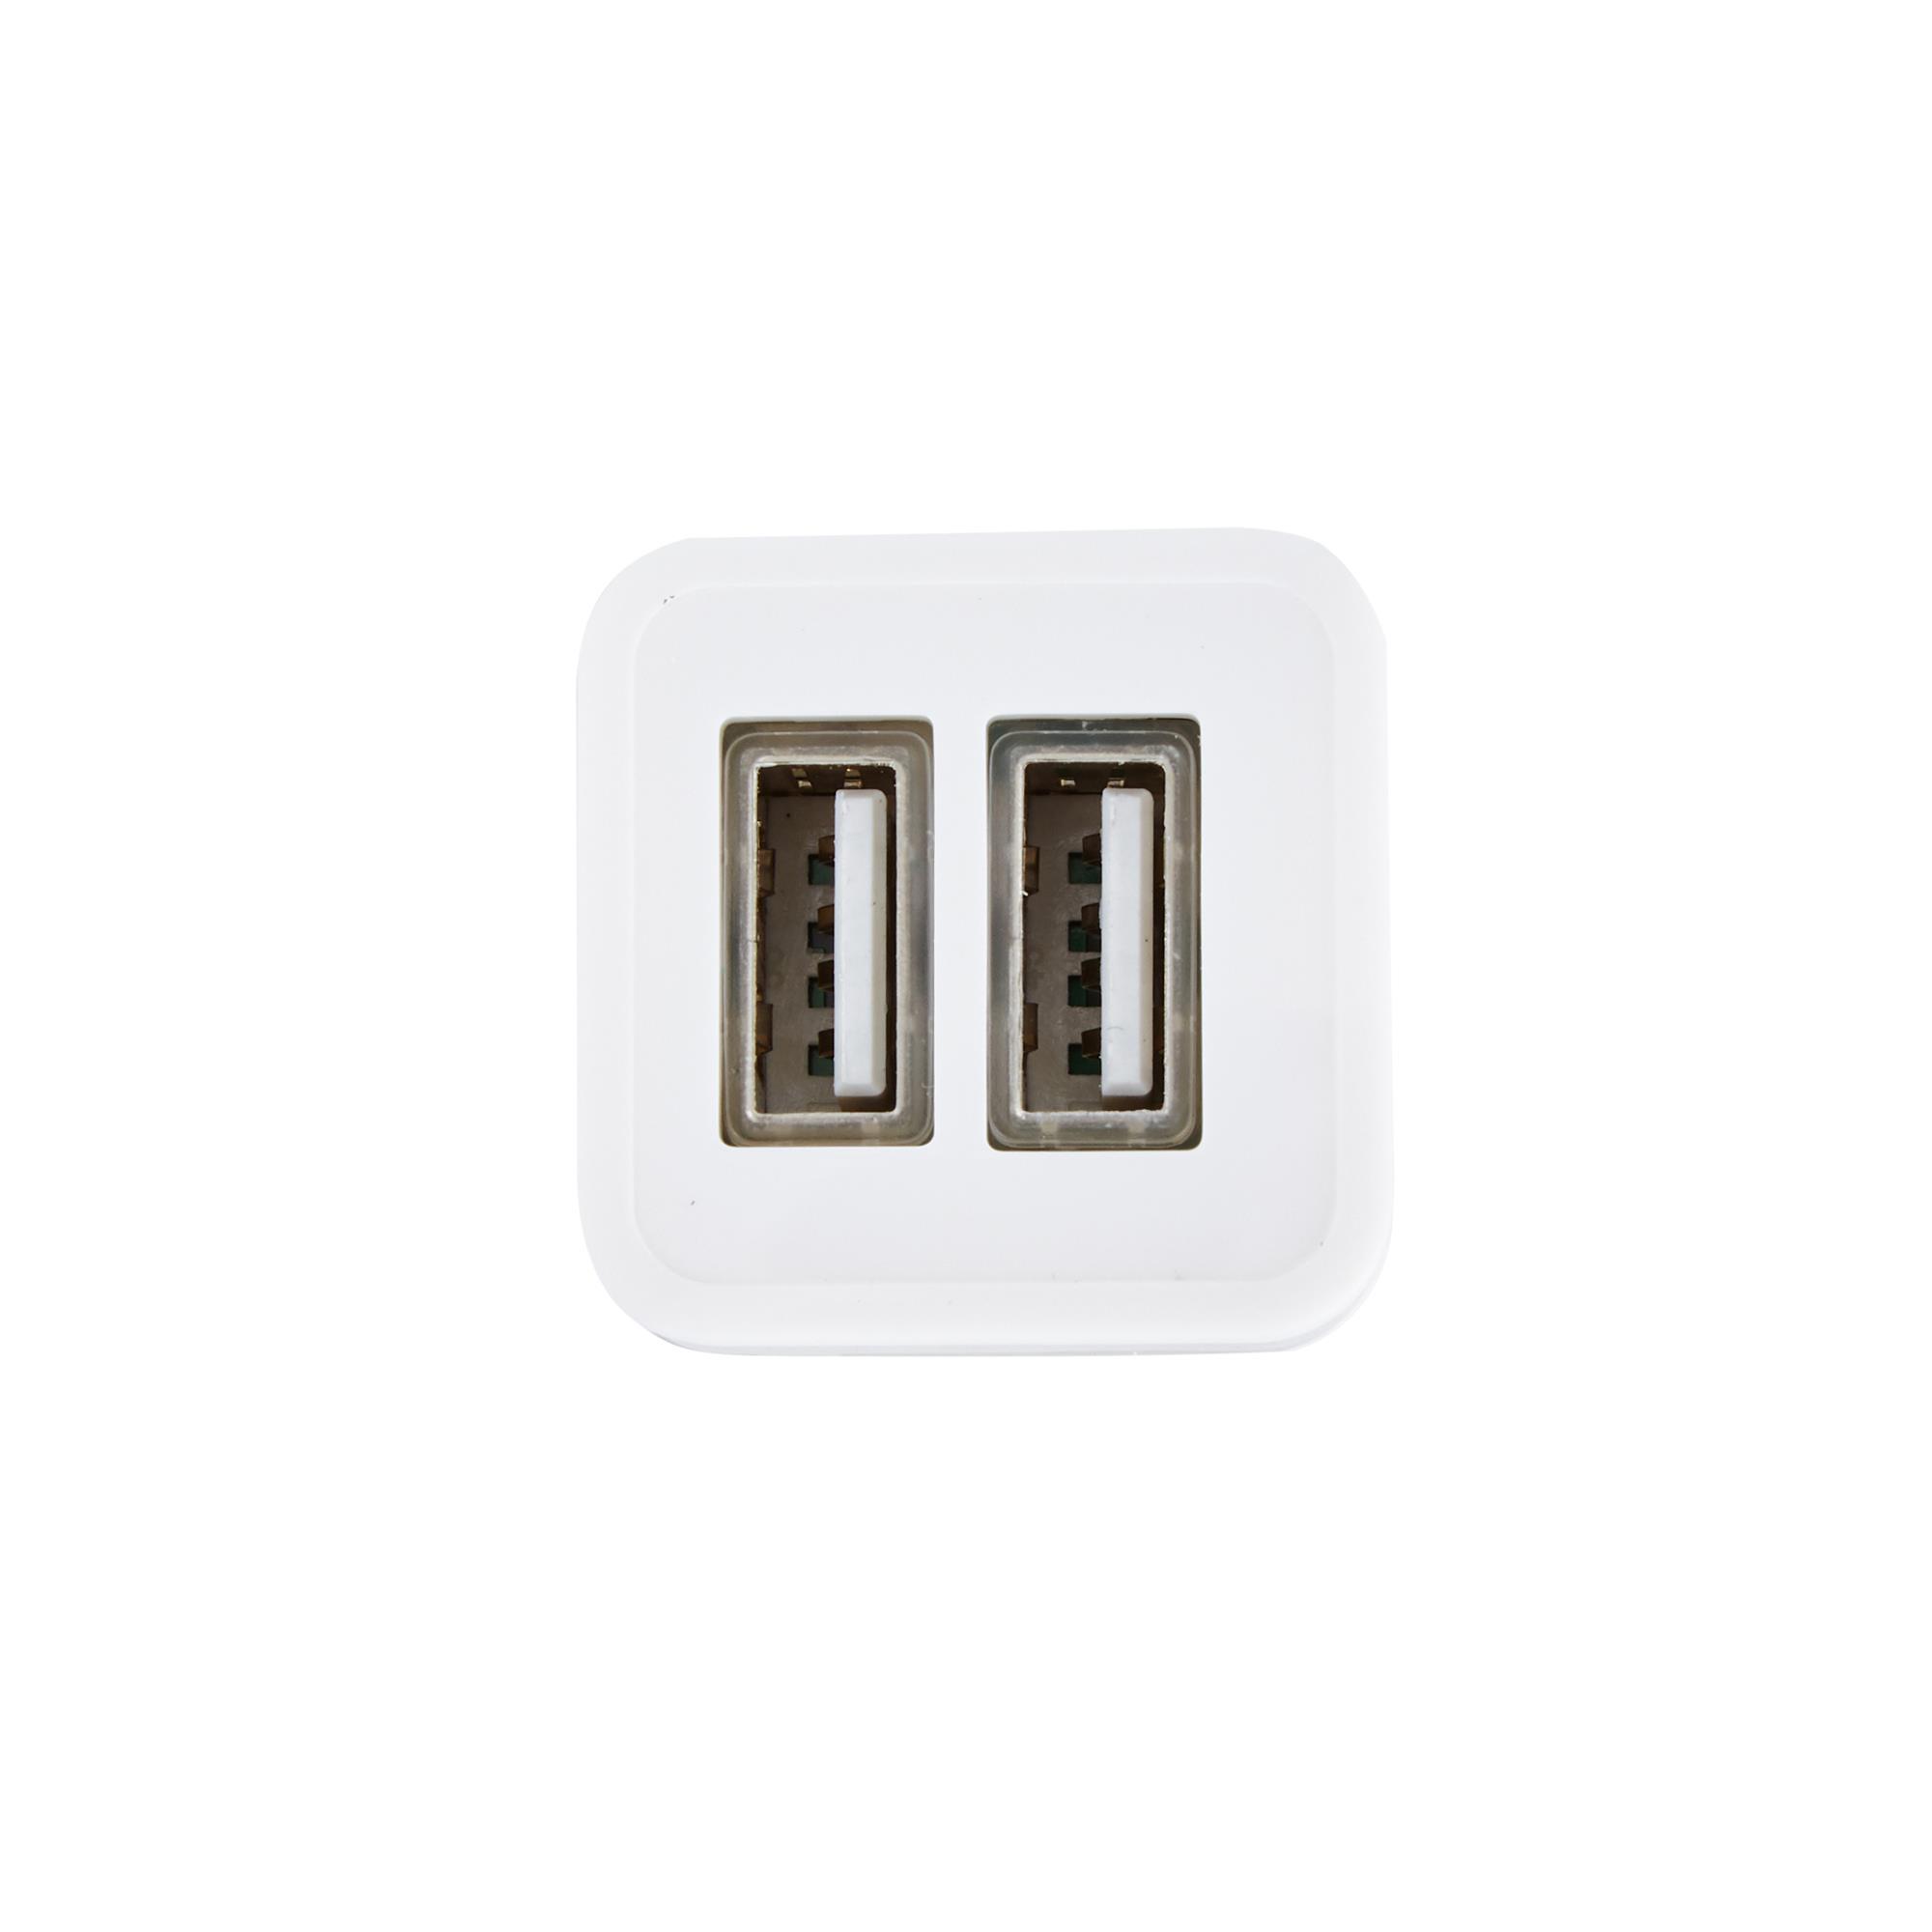 AVEC AV-M631 12V-USB ARAÇ ŞARJ CİHAZI + AV-W101 MİCRO USB KABLO SETİ